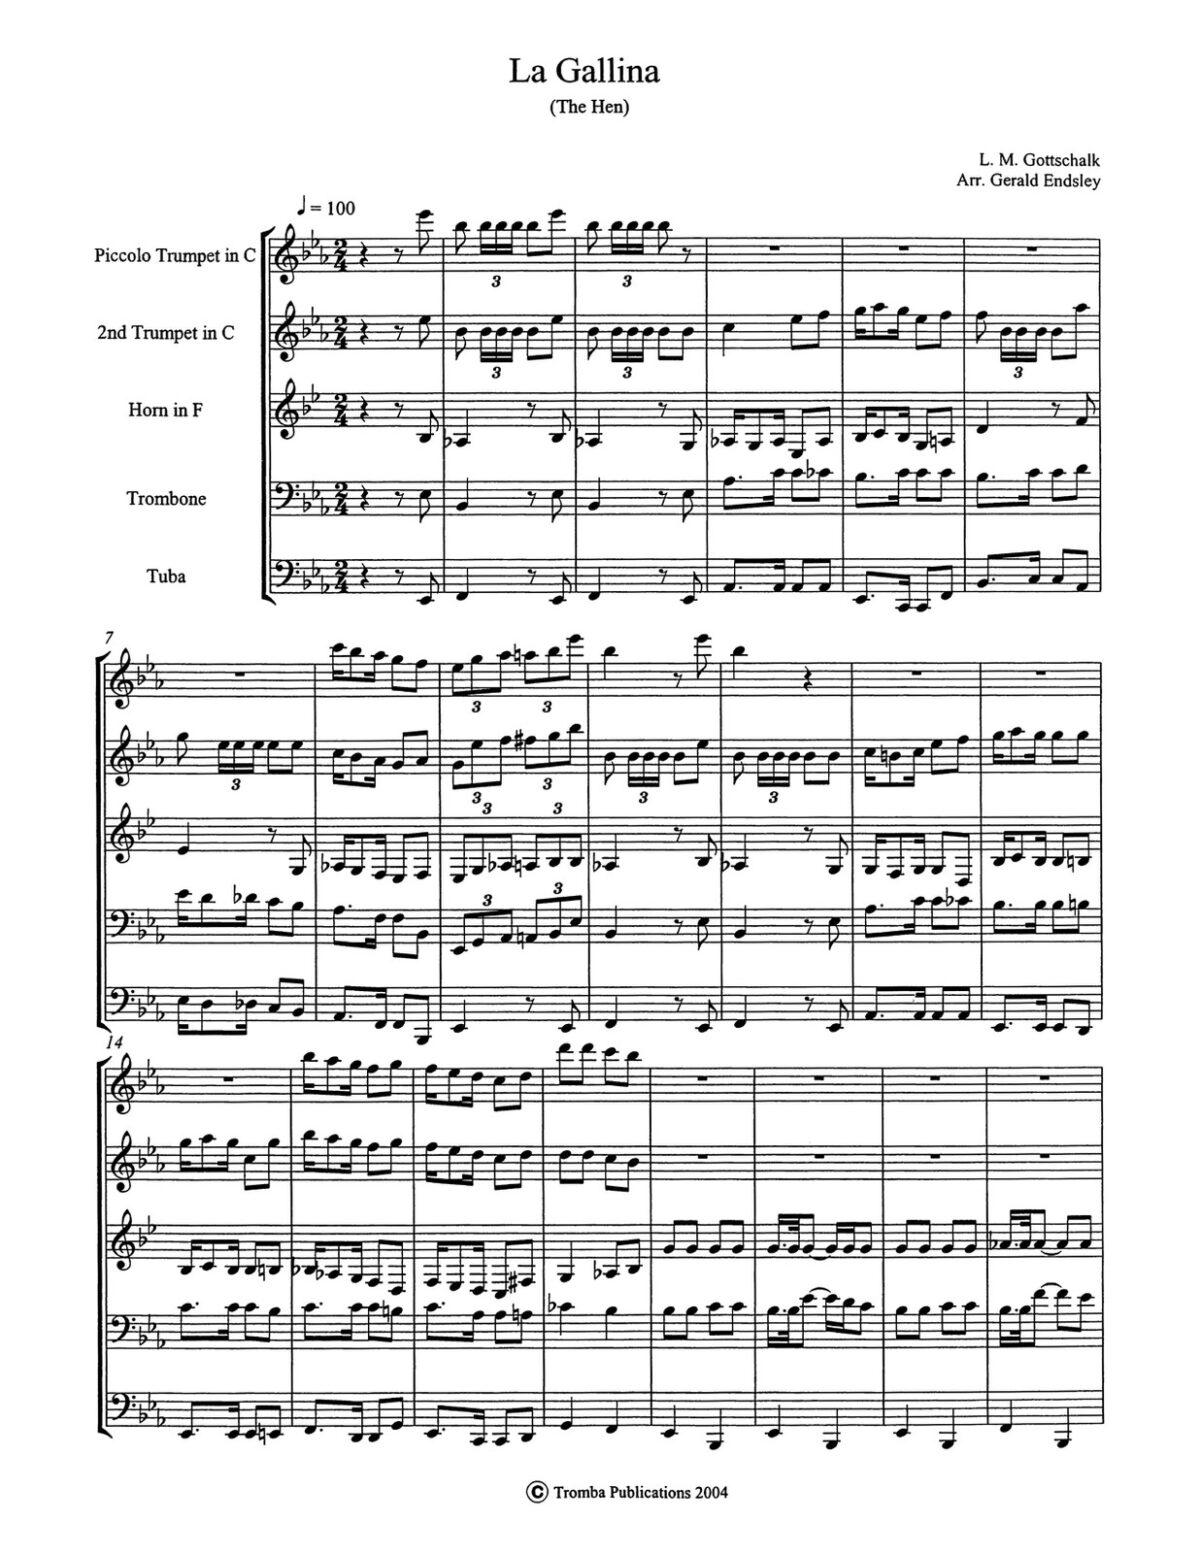 Endsley-Gottschalk, The Hen (La Gallina)-p17